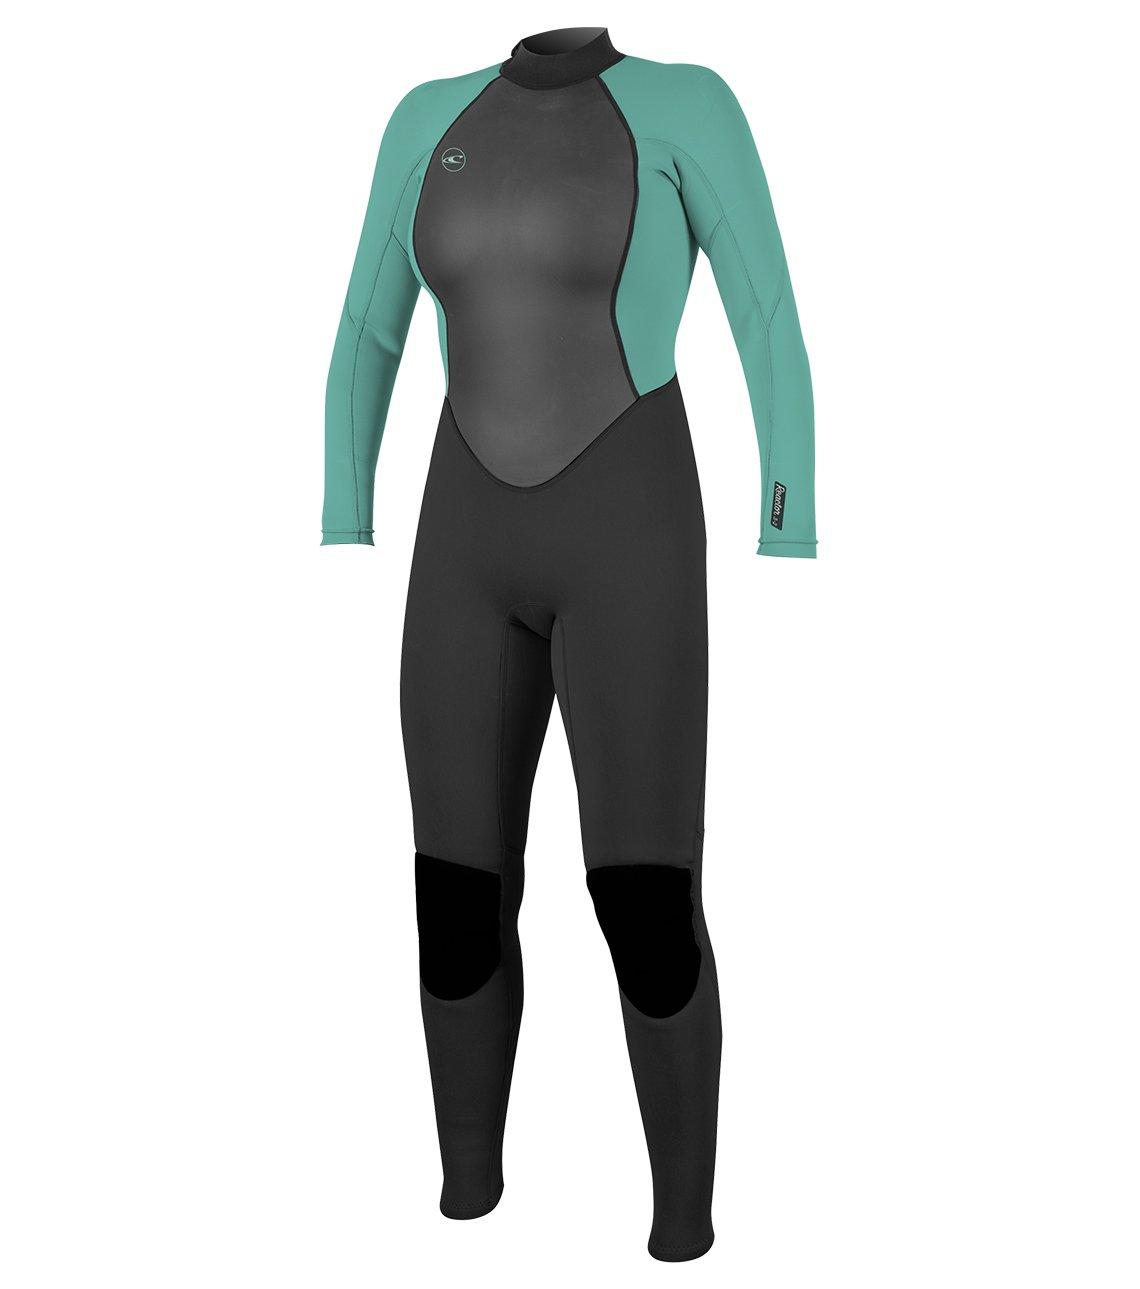 O'Neill Women's Reactor-2 3/2mm Back Zip Full Wetsuit, Black/Aqua, 4 by O'Neill Wetsuits